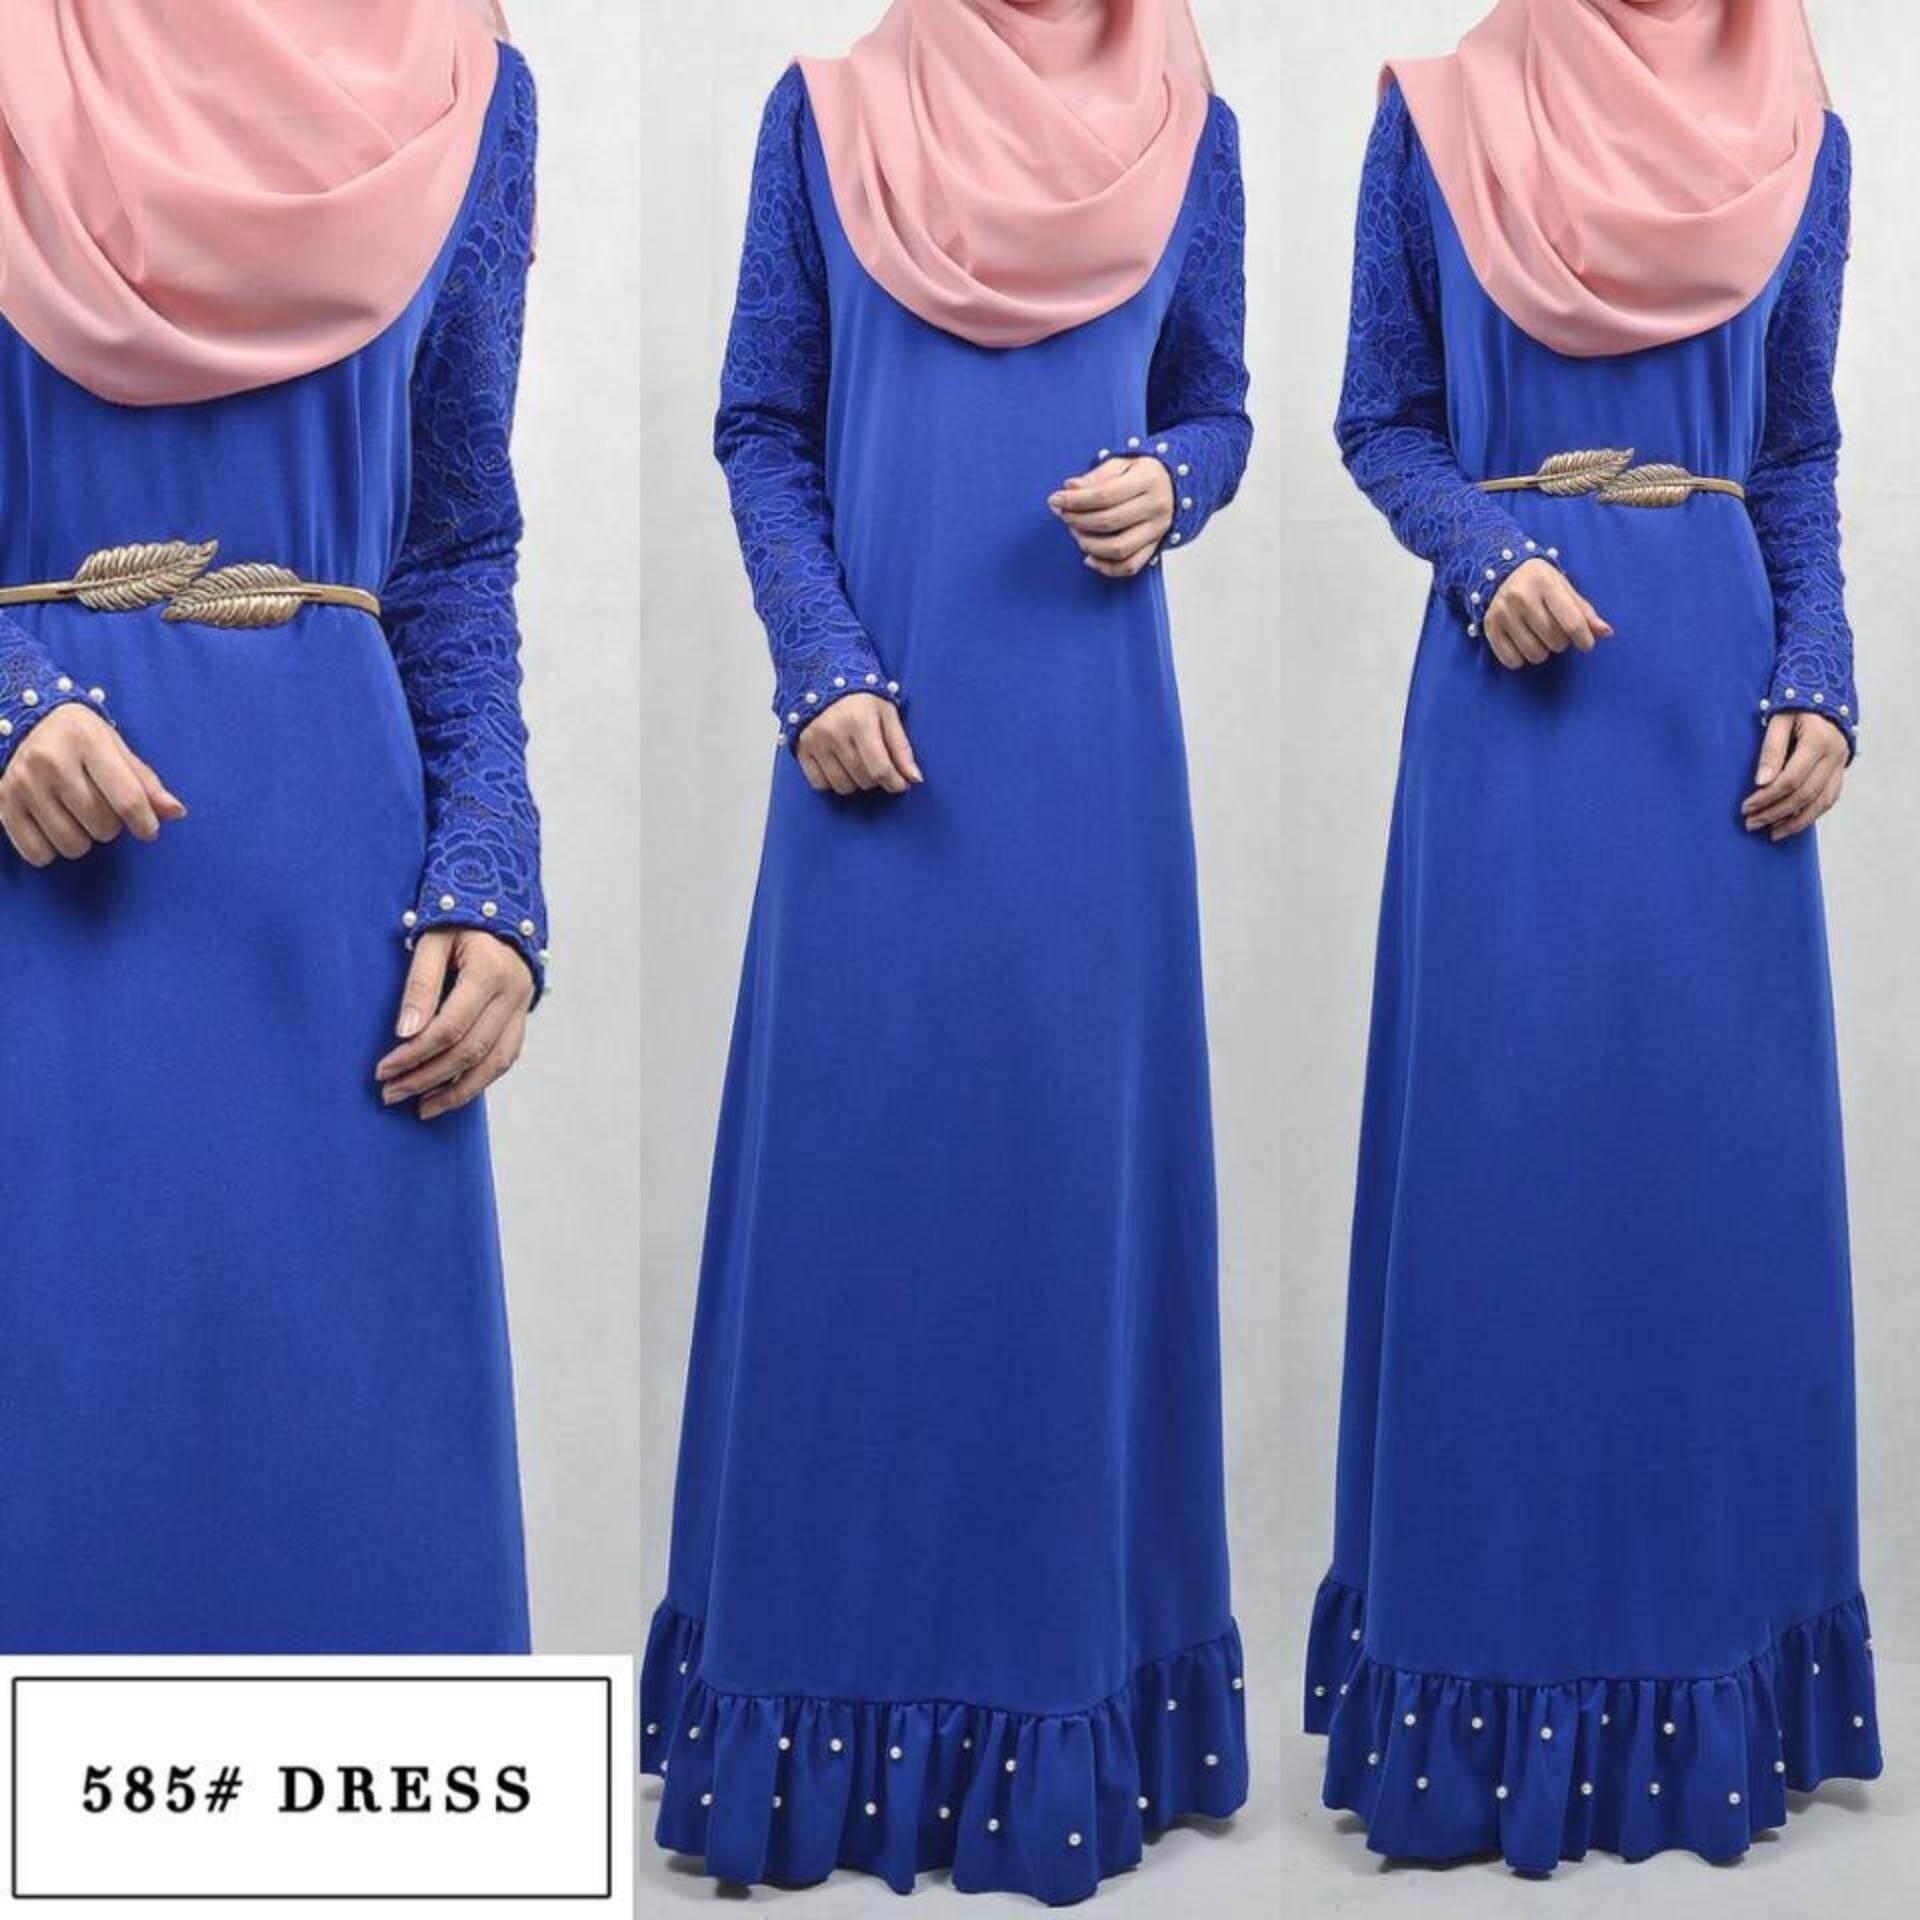 Sell Jubah Dress Cheapest Best Quality My Store Anneyep Printed Flowers Kaftan Muslim Maxi Myr 53